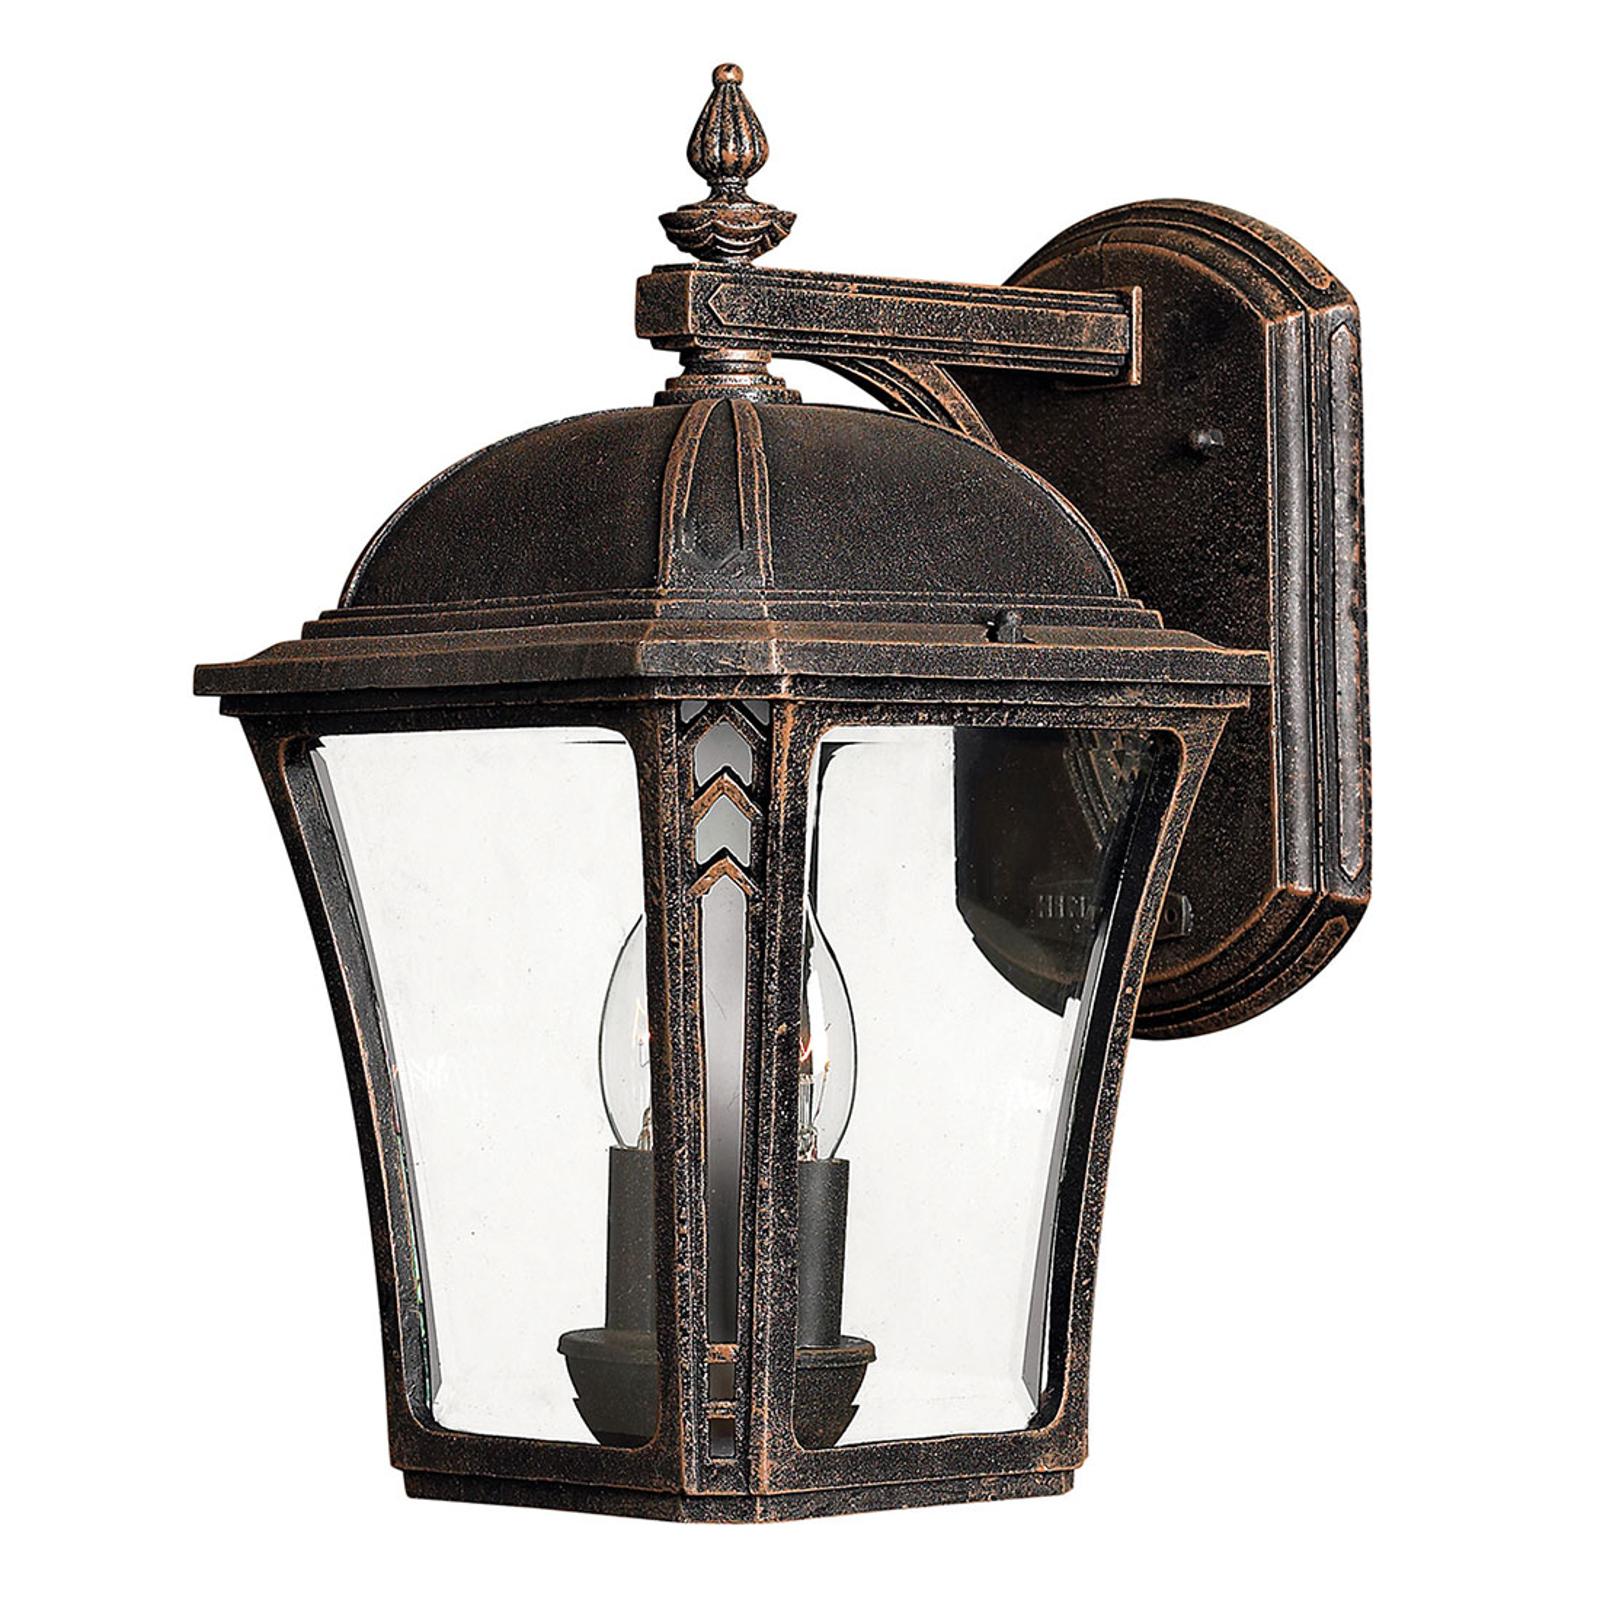 Buitenwandlamp Wabash M, hoogte 34,9 cm